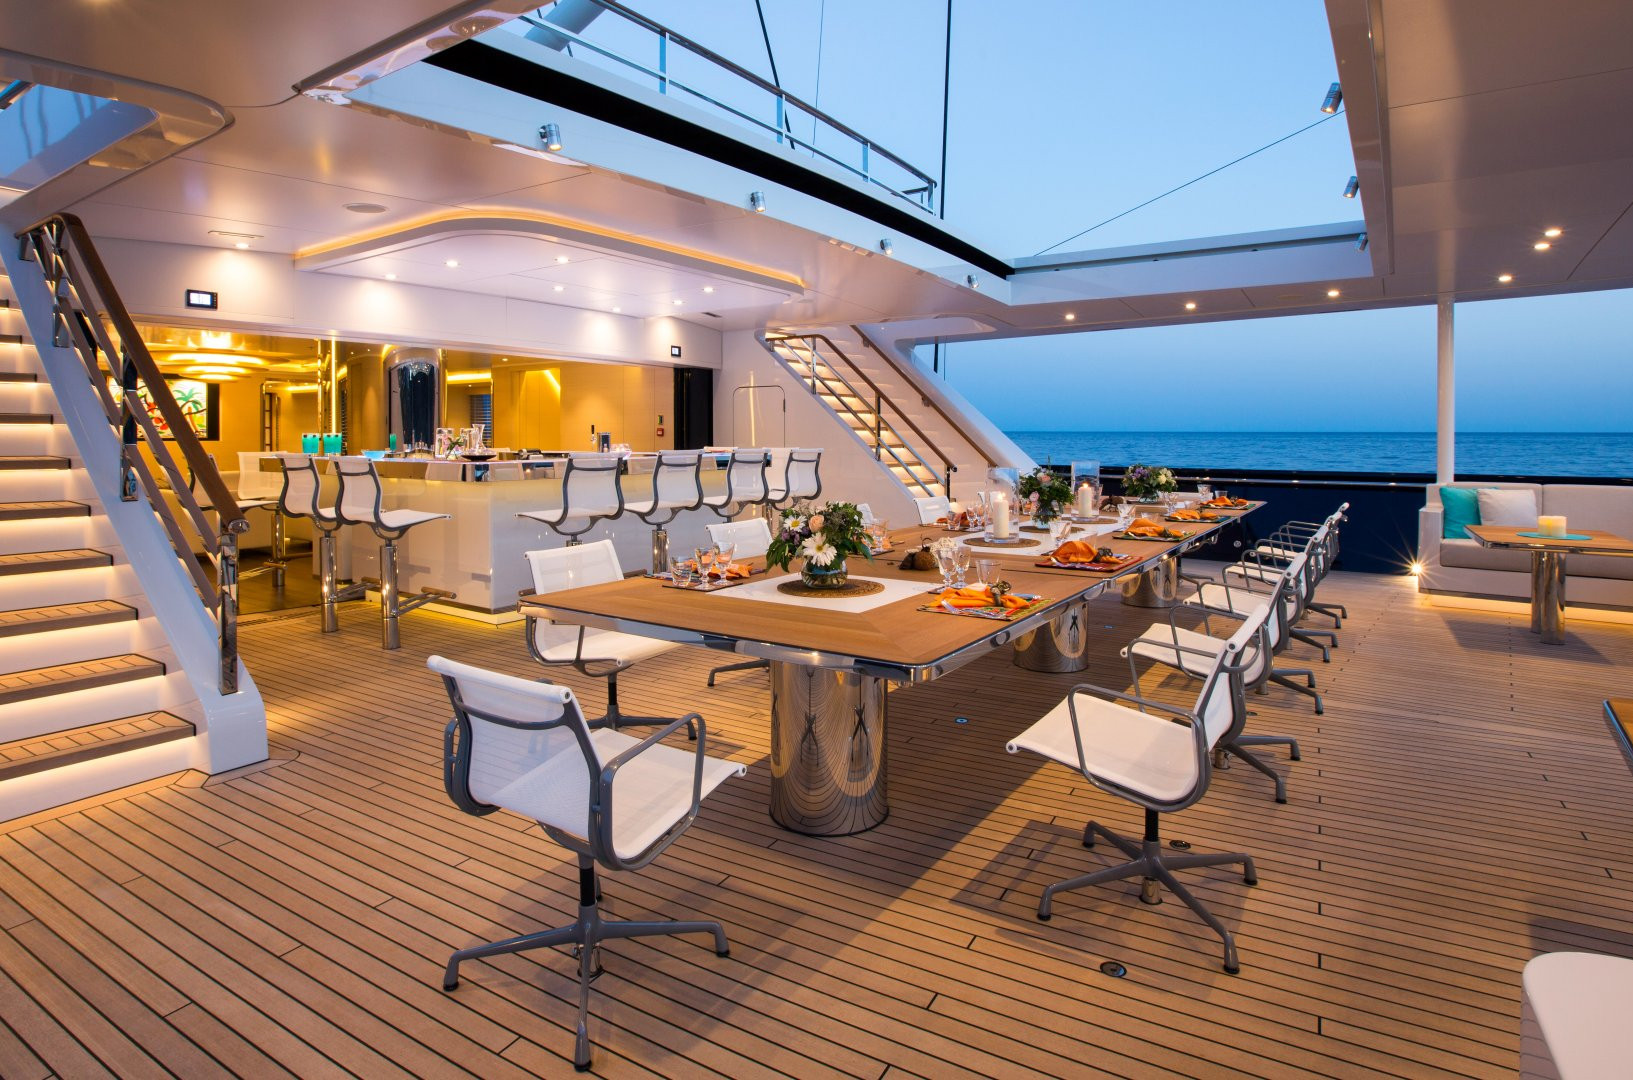 Yacht AQUIJO - Alfresco dinning on deck